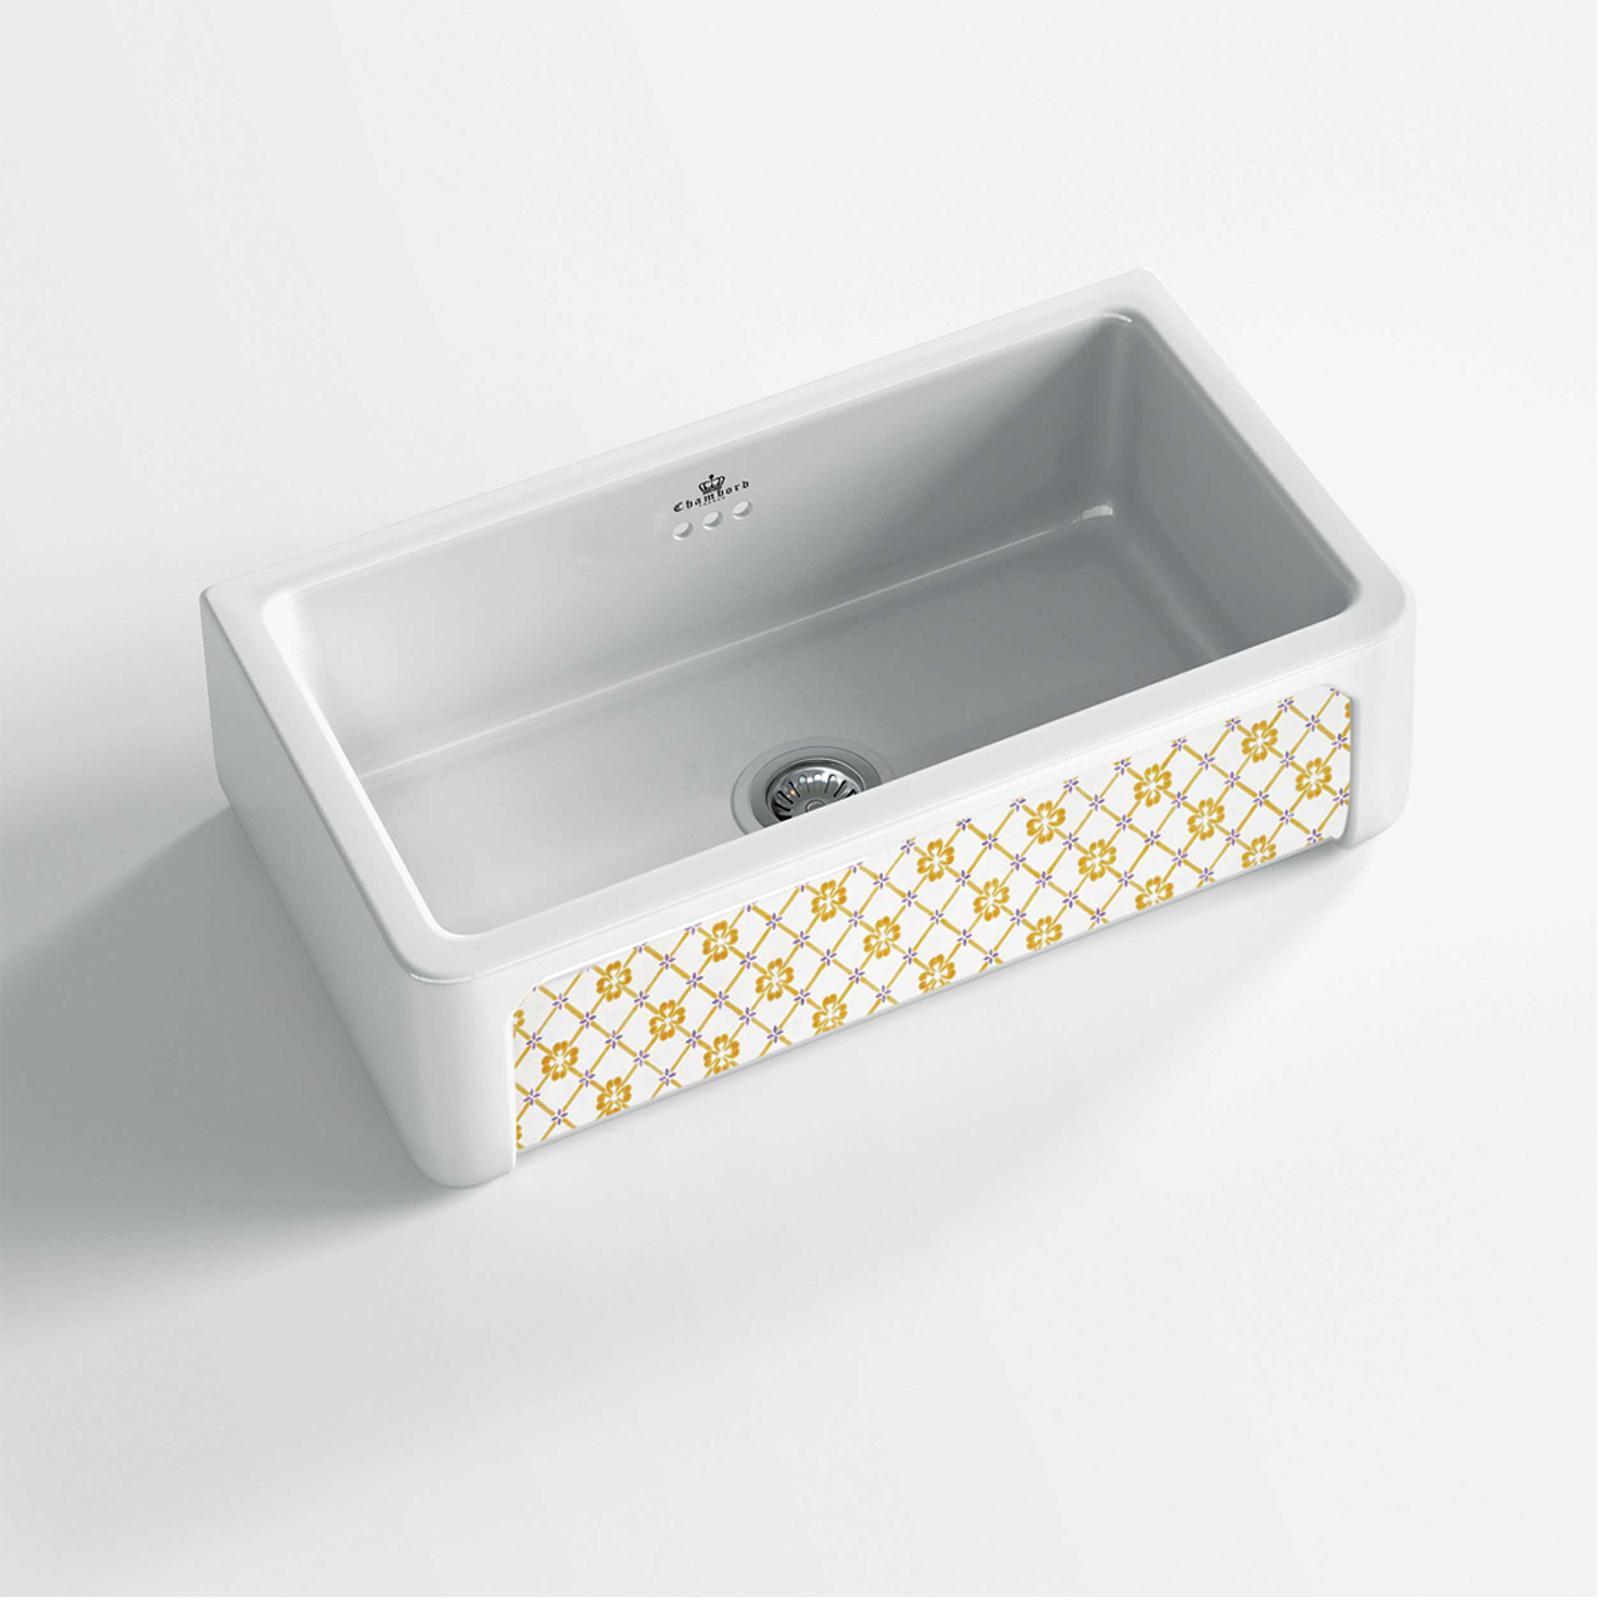 High-quality sink Henri II Provence - single bowl, decorated ceramic